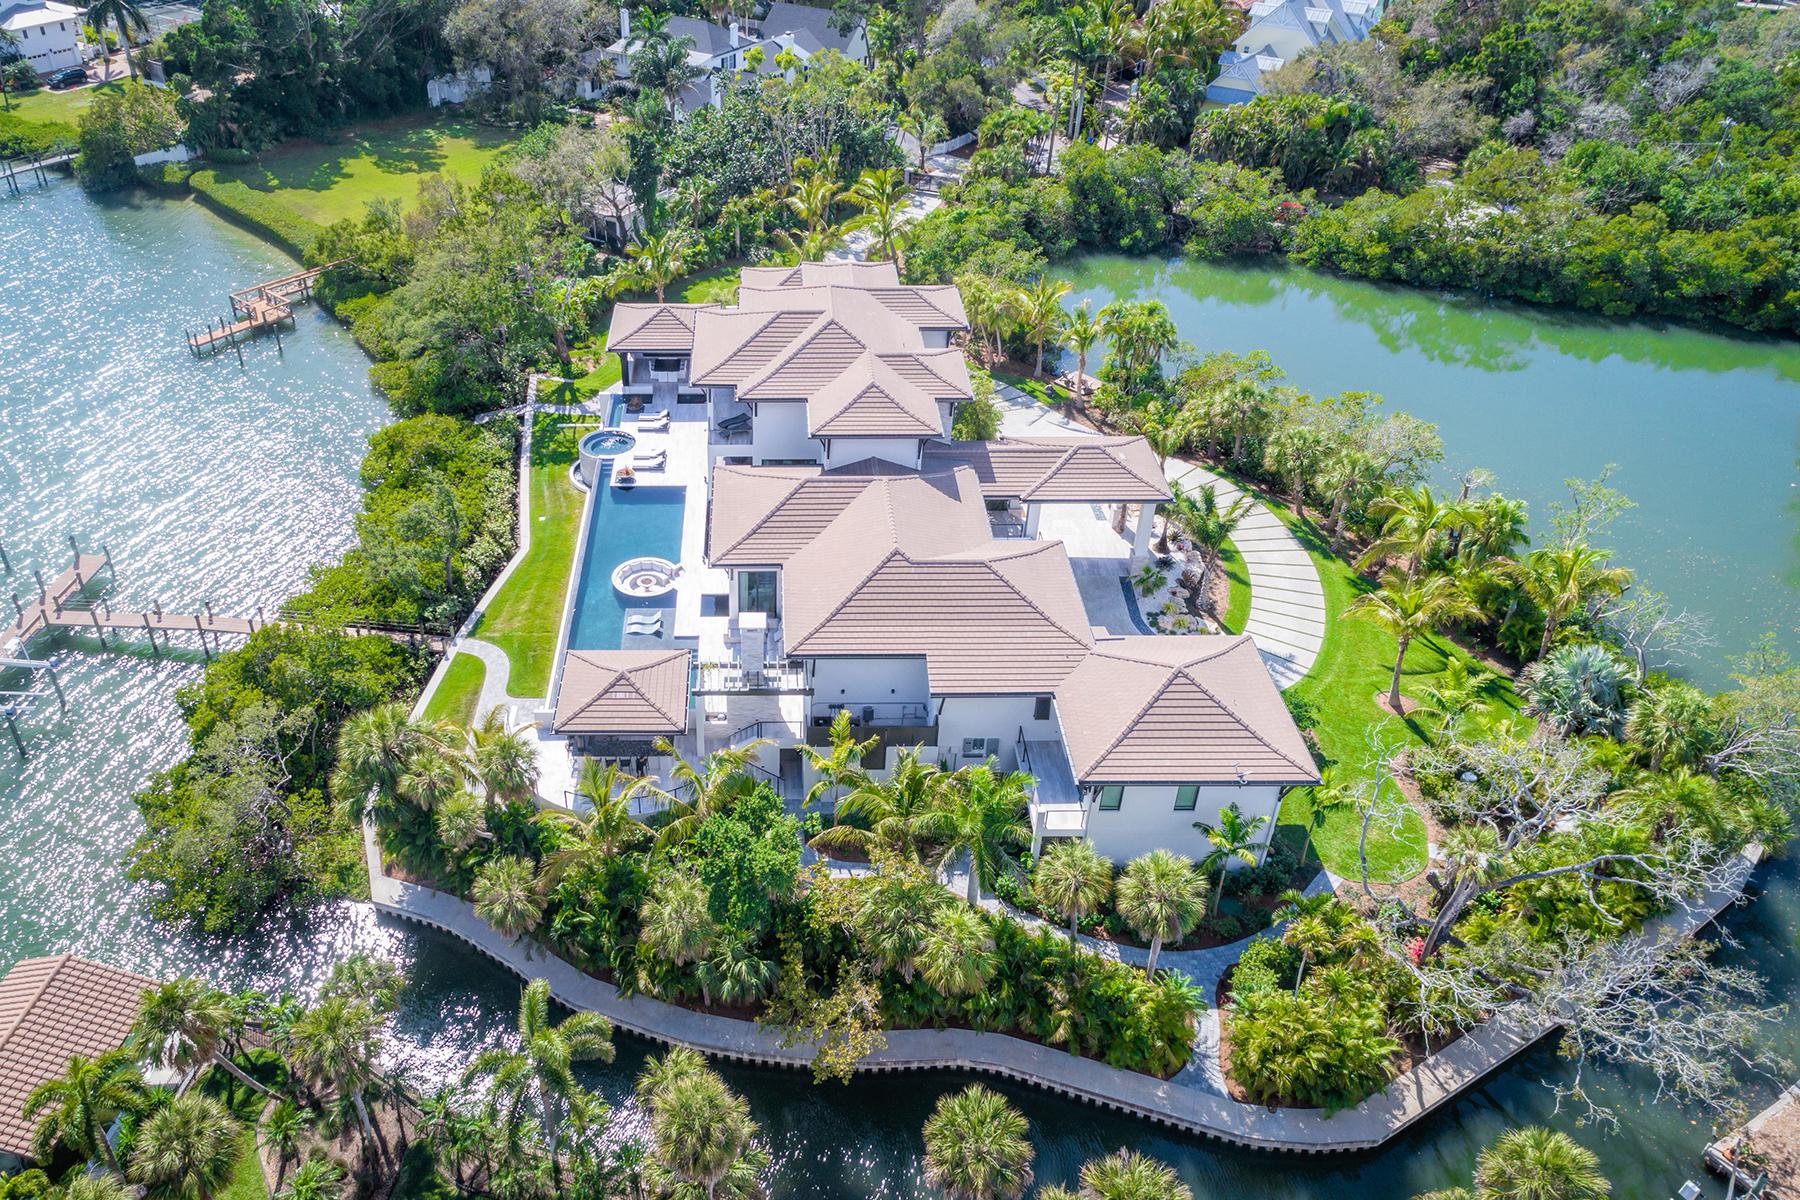 Single Family Home for Sale at BAY ISLAND 3799 Flamingo Ave Sarasota, Florida 34242 United States